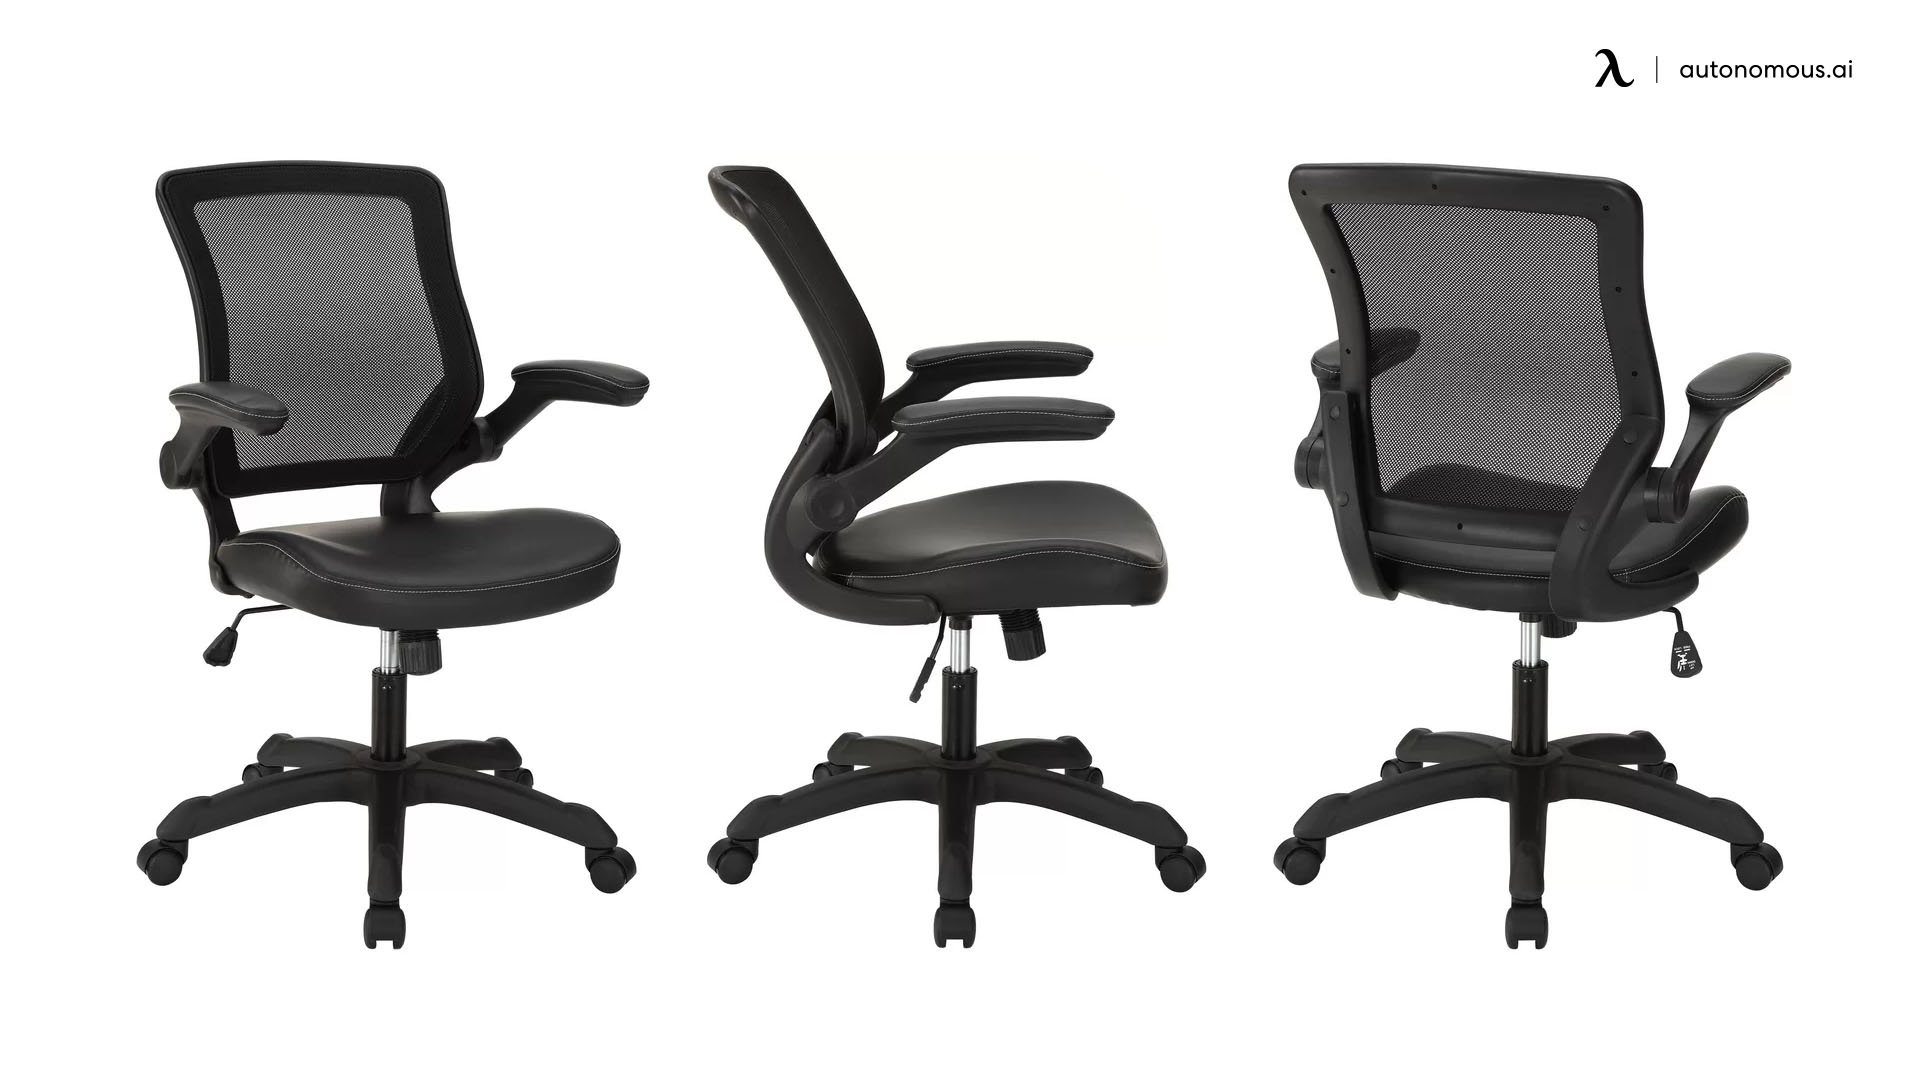 Zipcode Mesh Chair with Lumbar Support